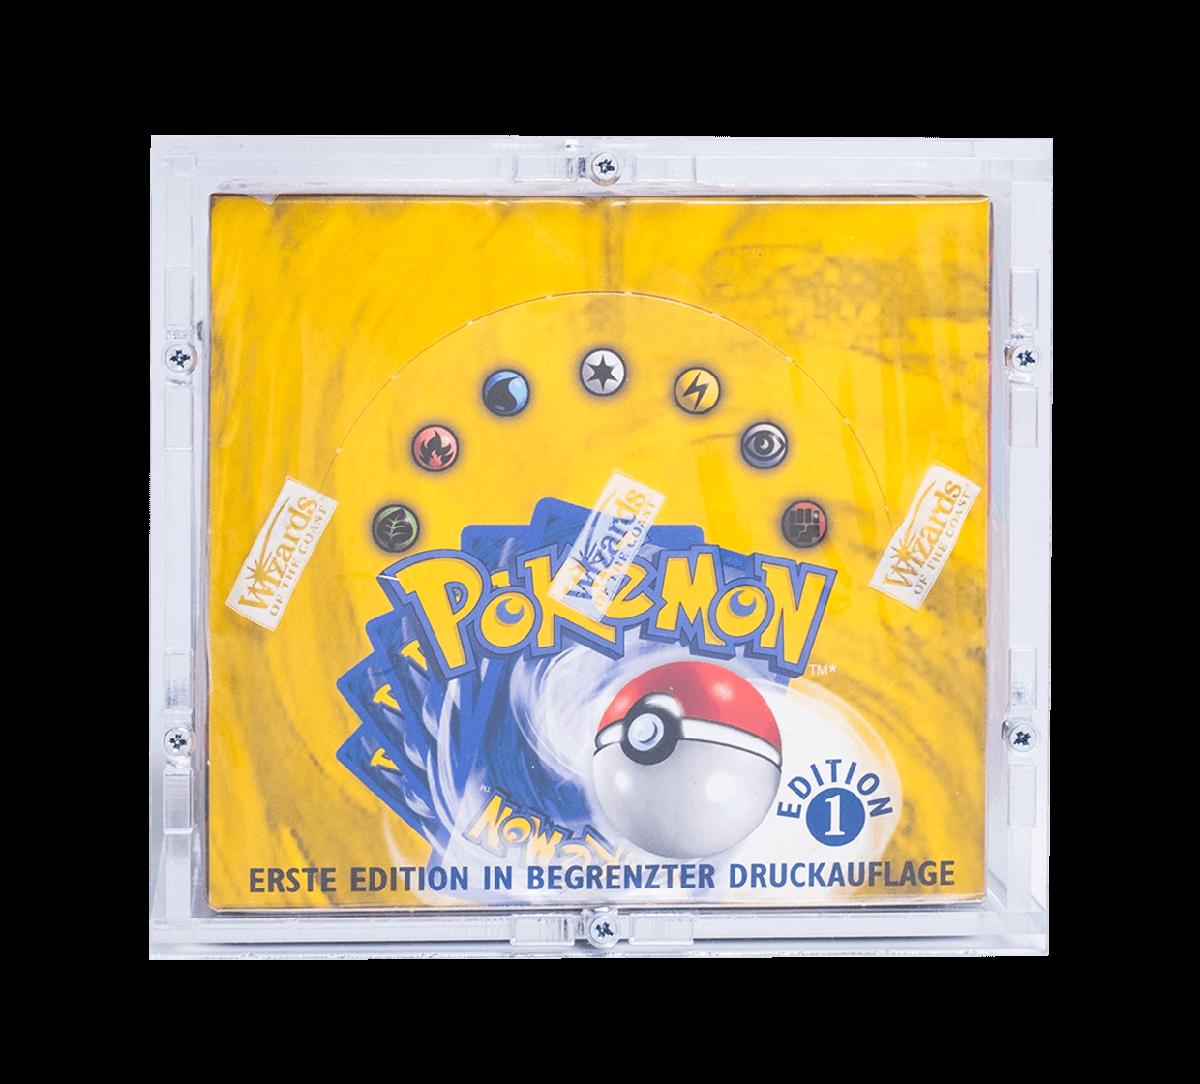 Pokémon 1st Edition Booster Box Image